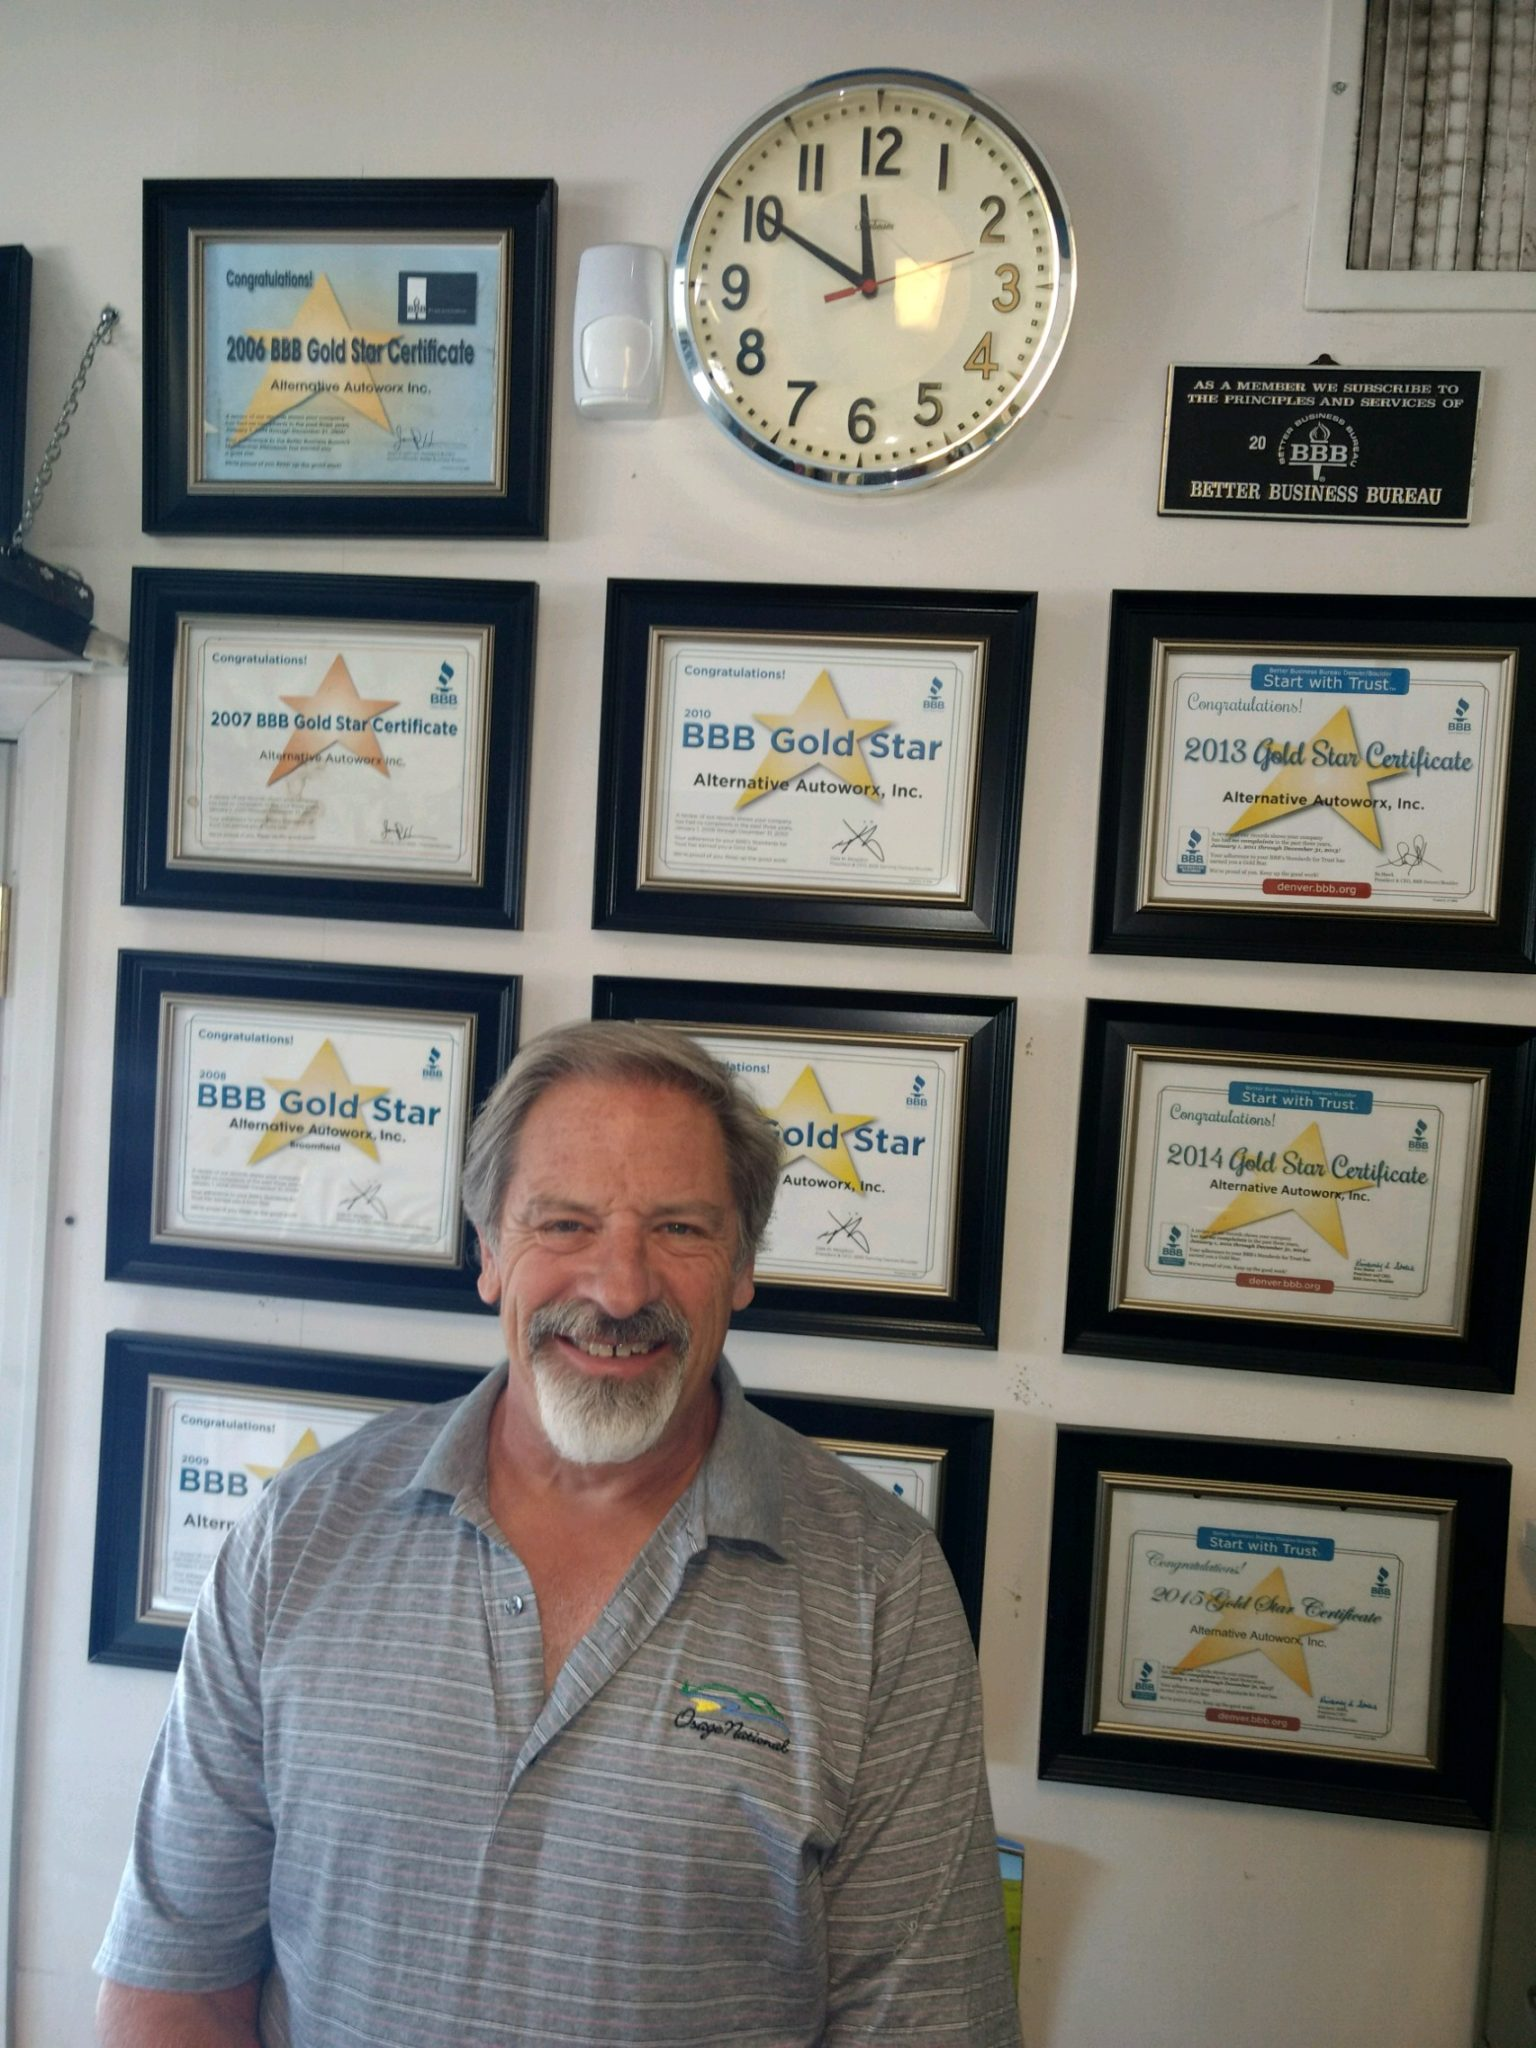 Joel Edson, owner of Alternative Autoworx